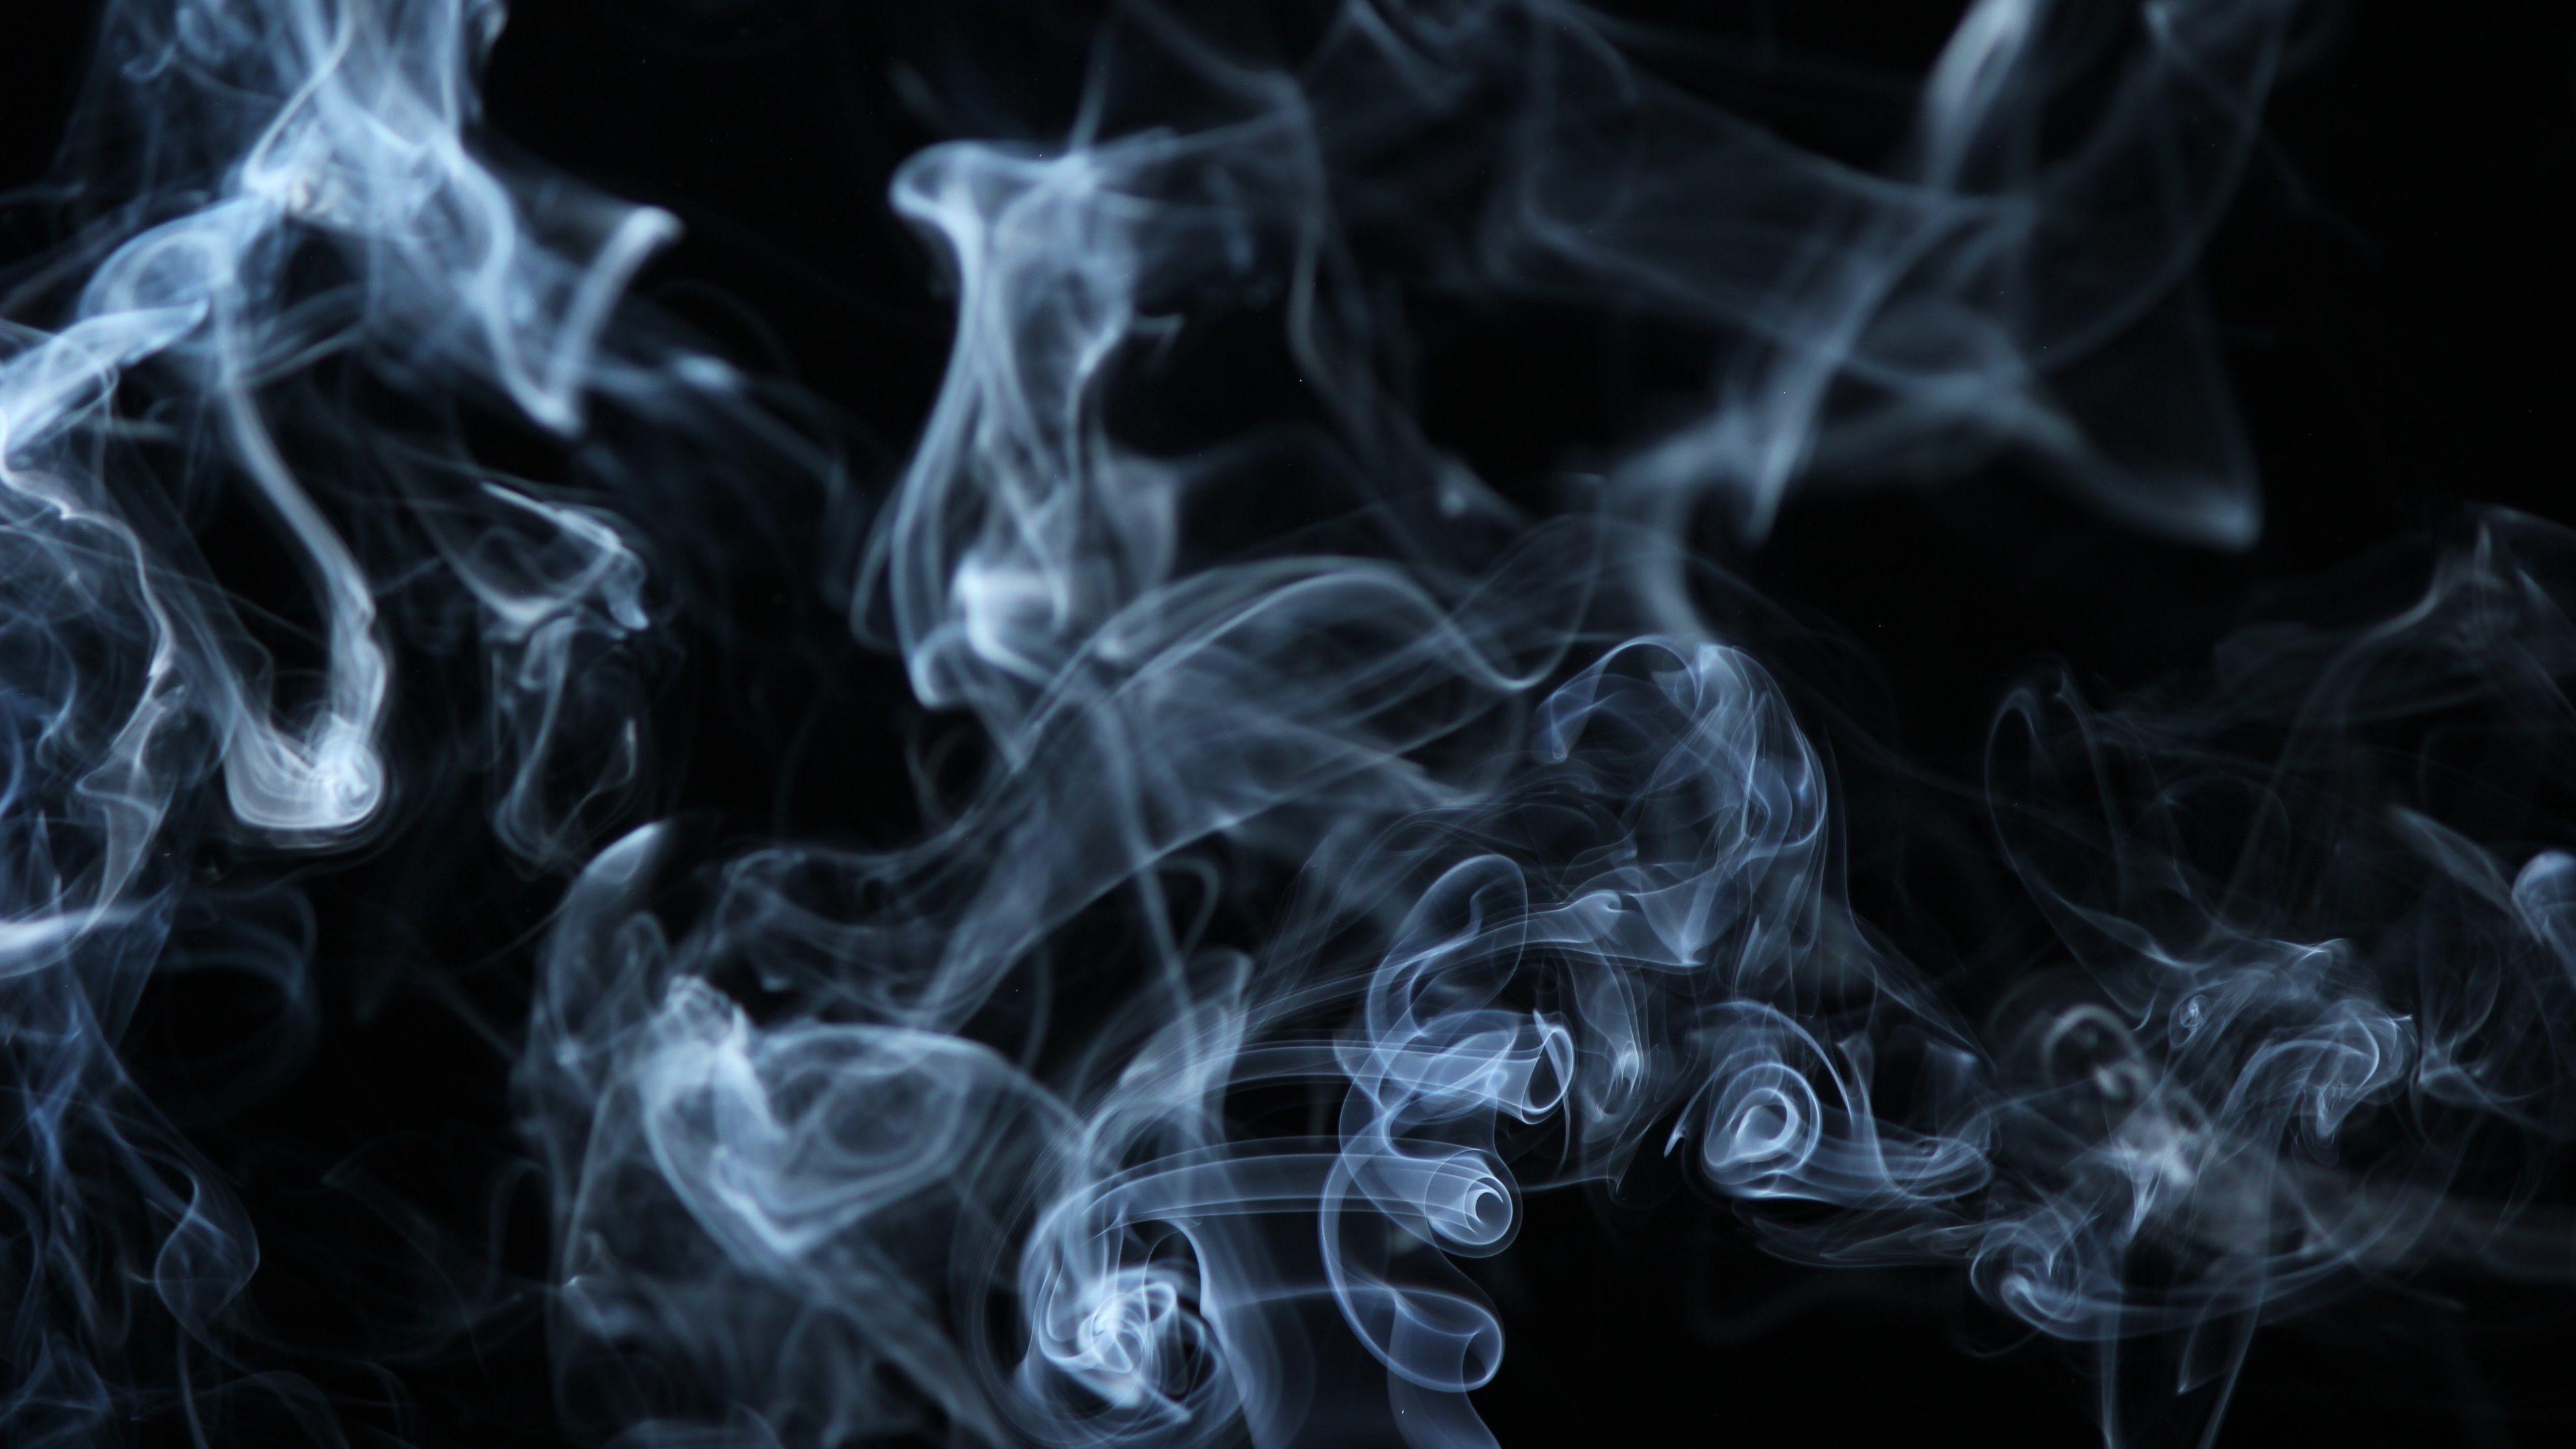 Smoke On Black Background Wallpapers Black Smoke Background 4k 3840x2160 Download Hd Wallpaper Wallpapertip